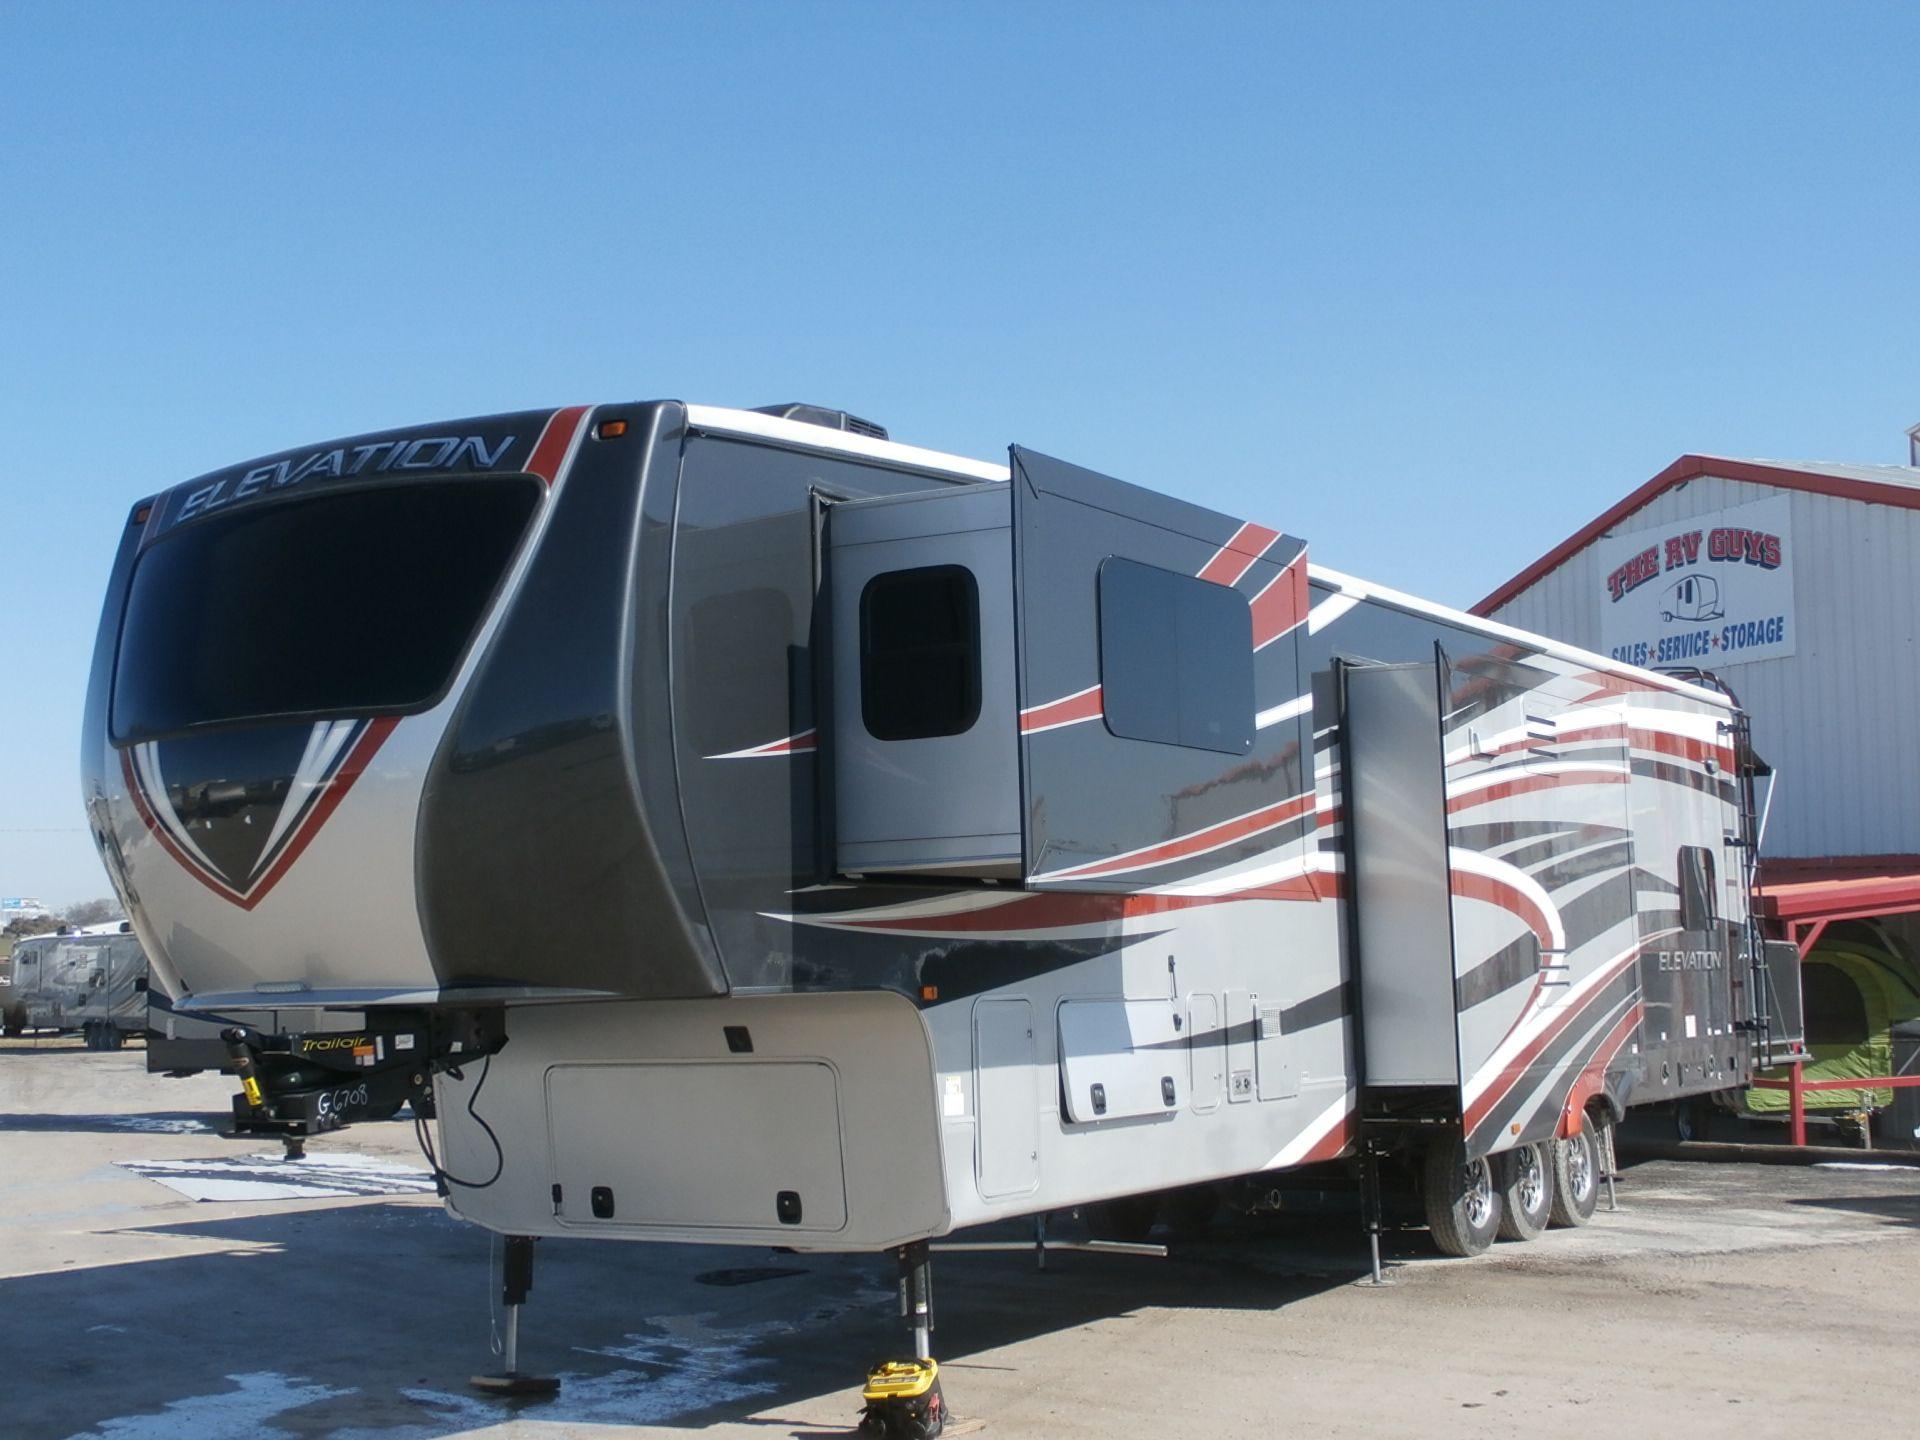 Las Vegas Toy Hauler Fifth wheel campers, Camper living